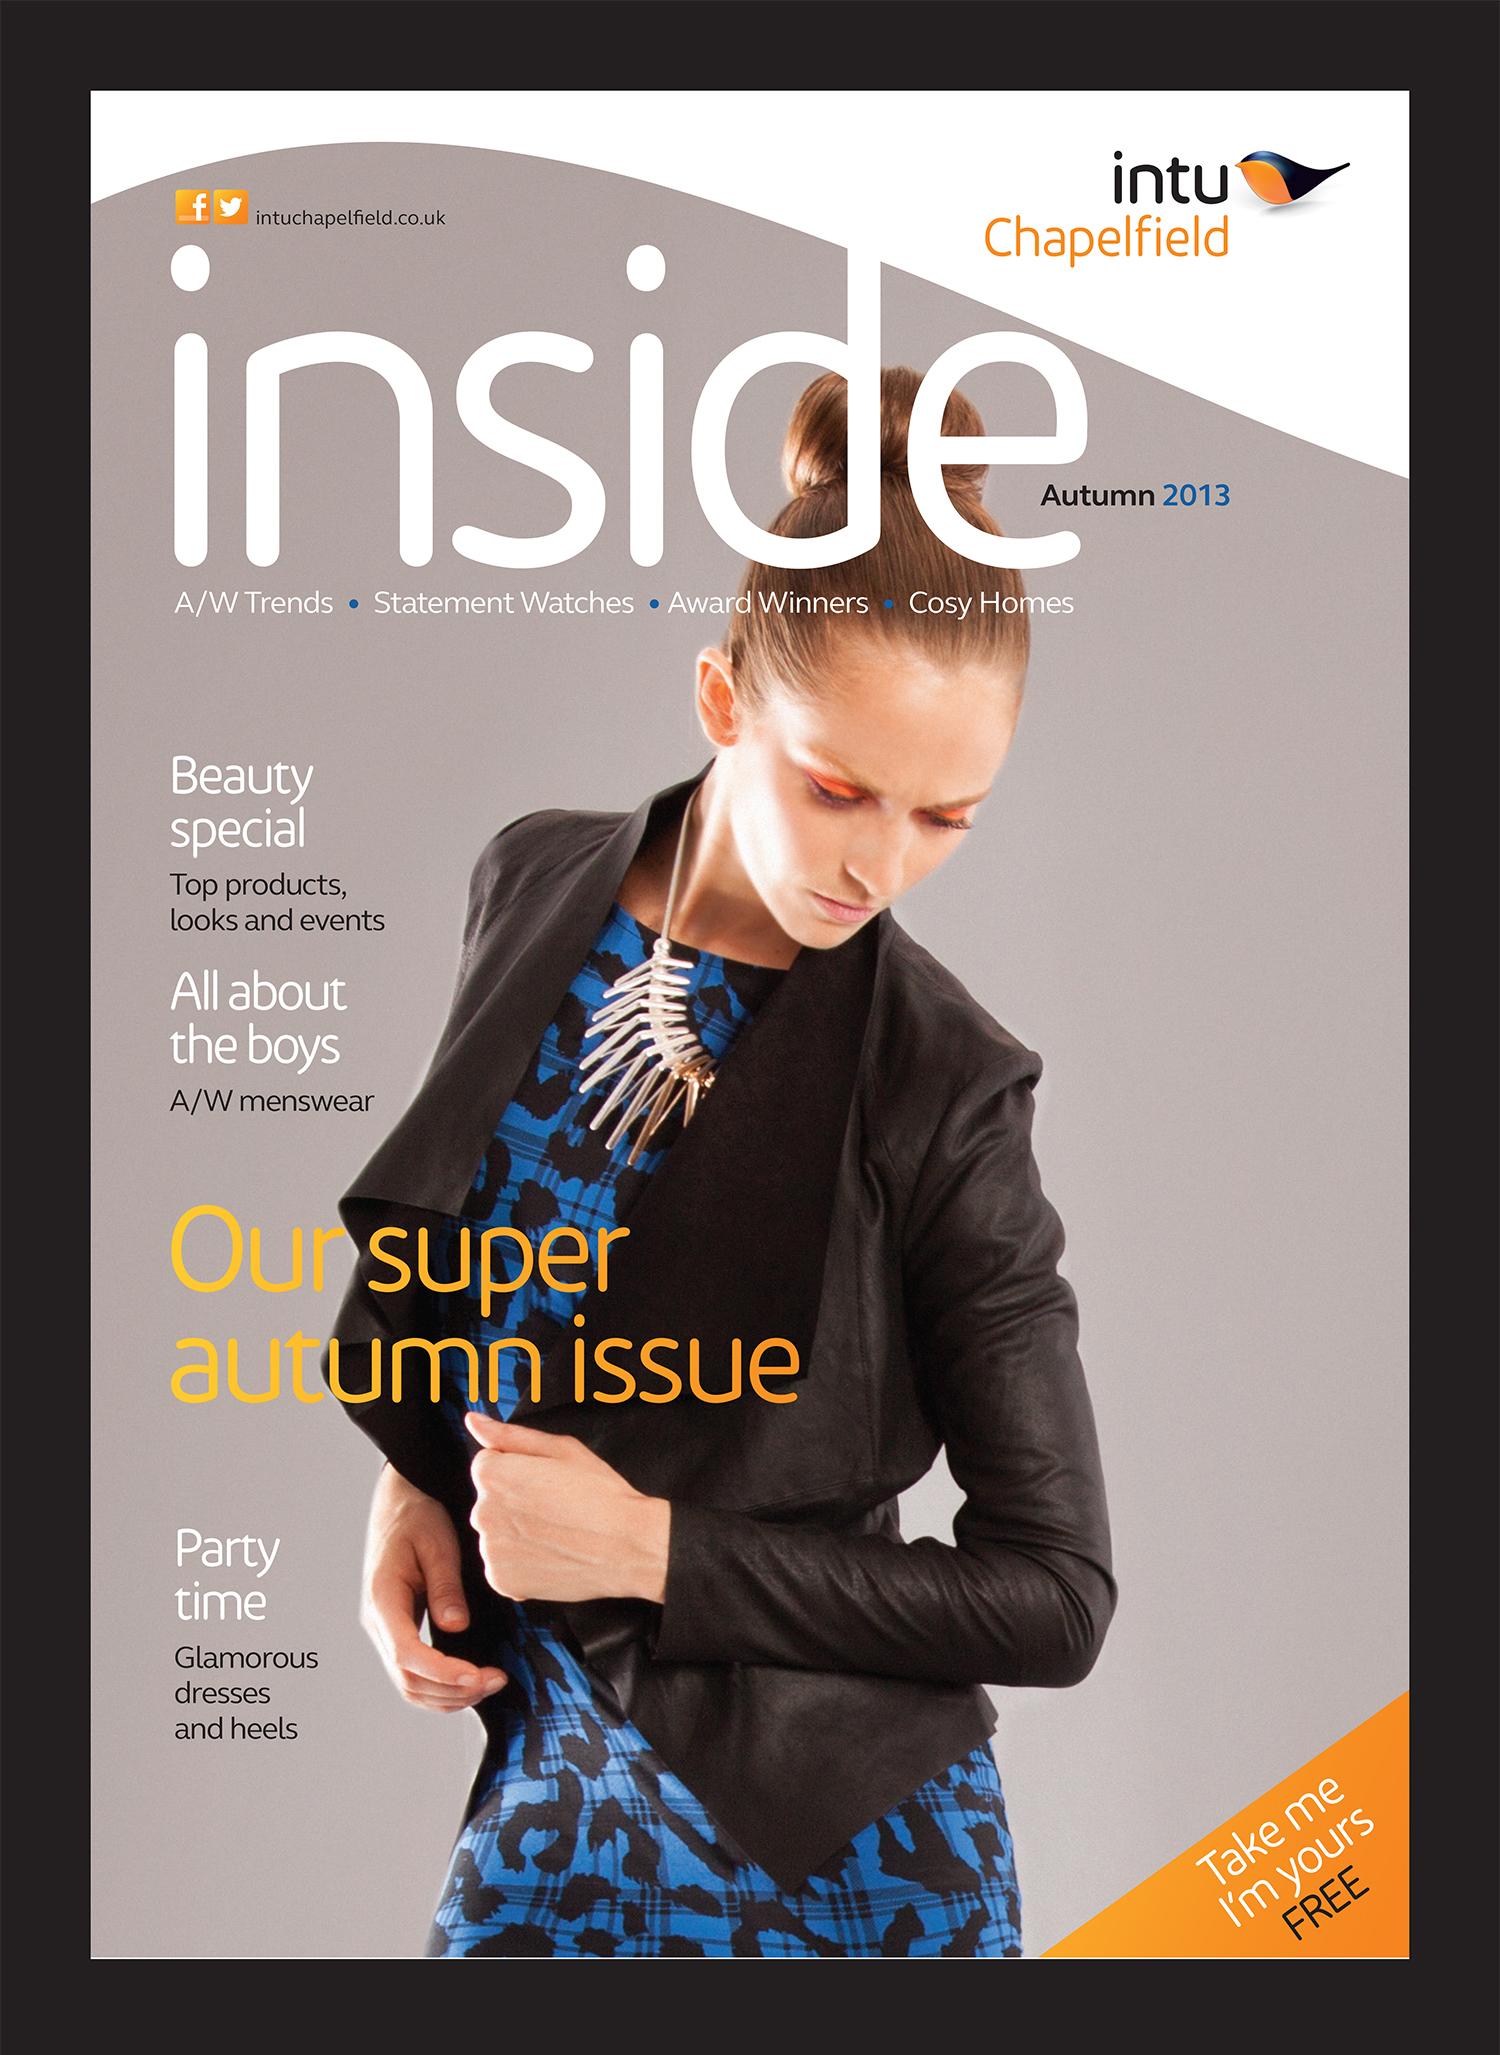 intu-cover1.jpg